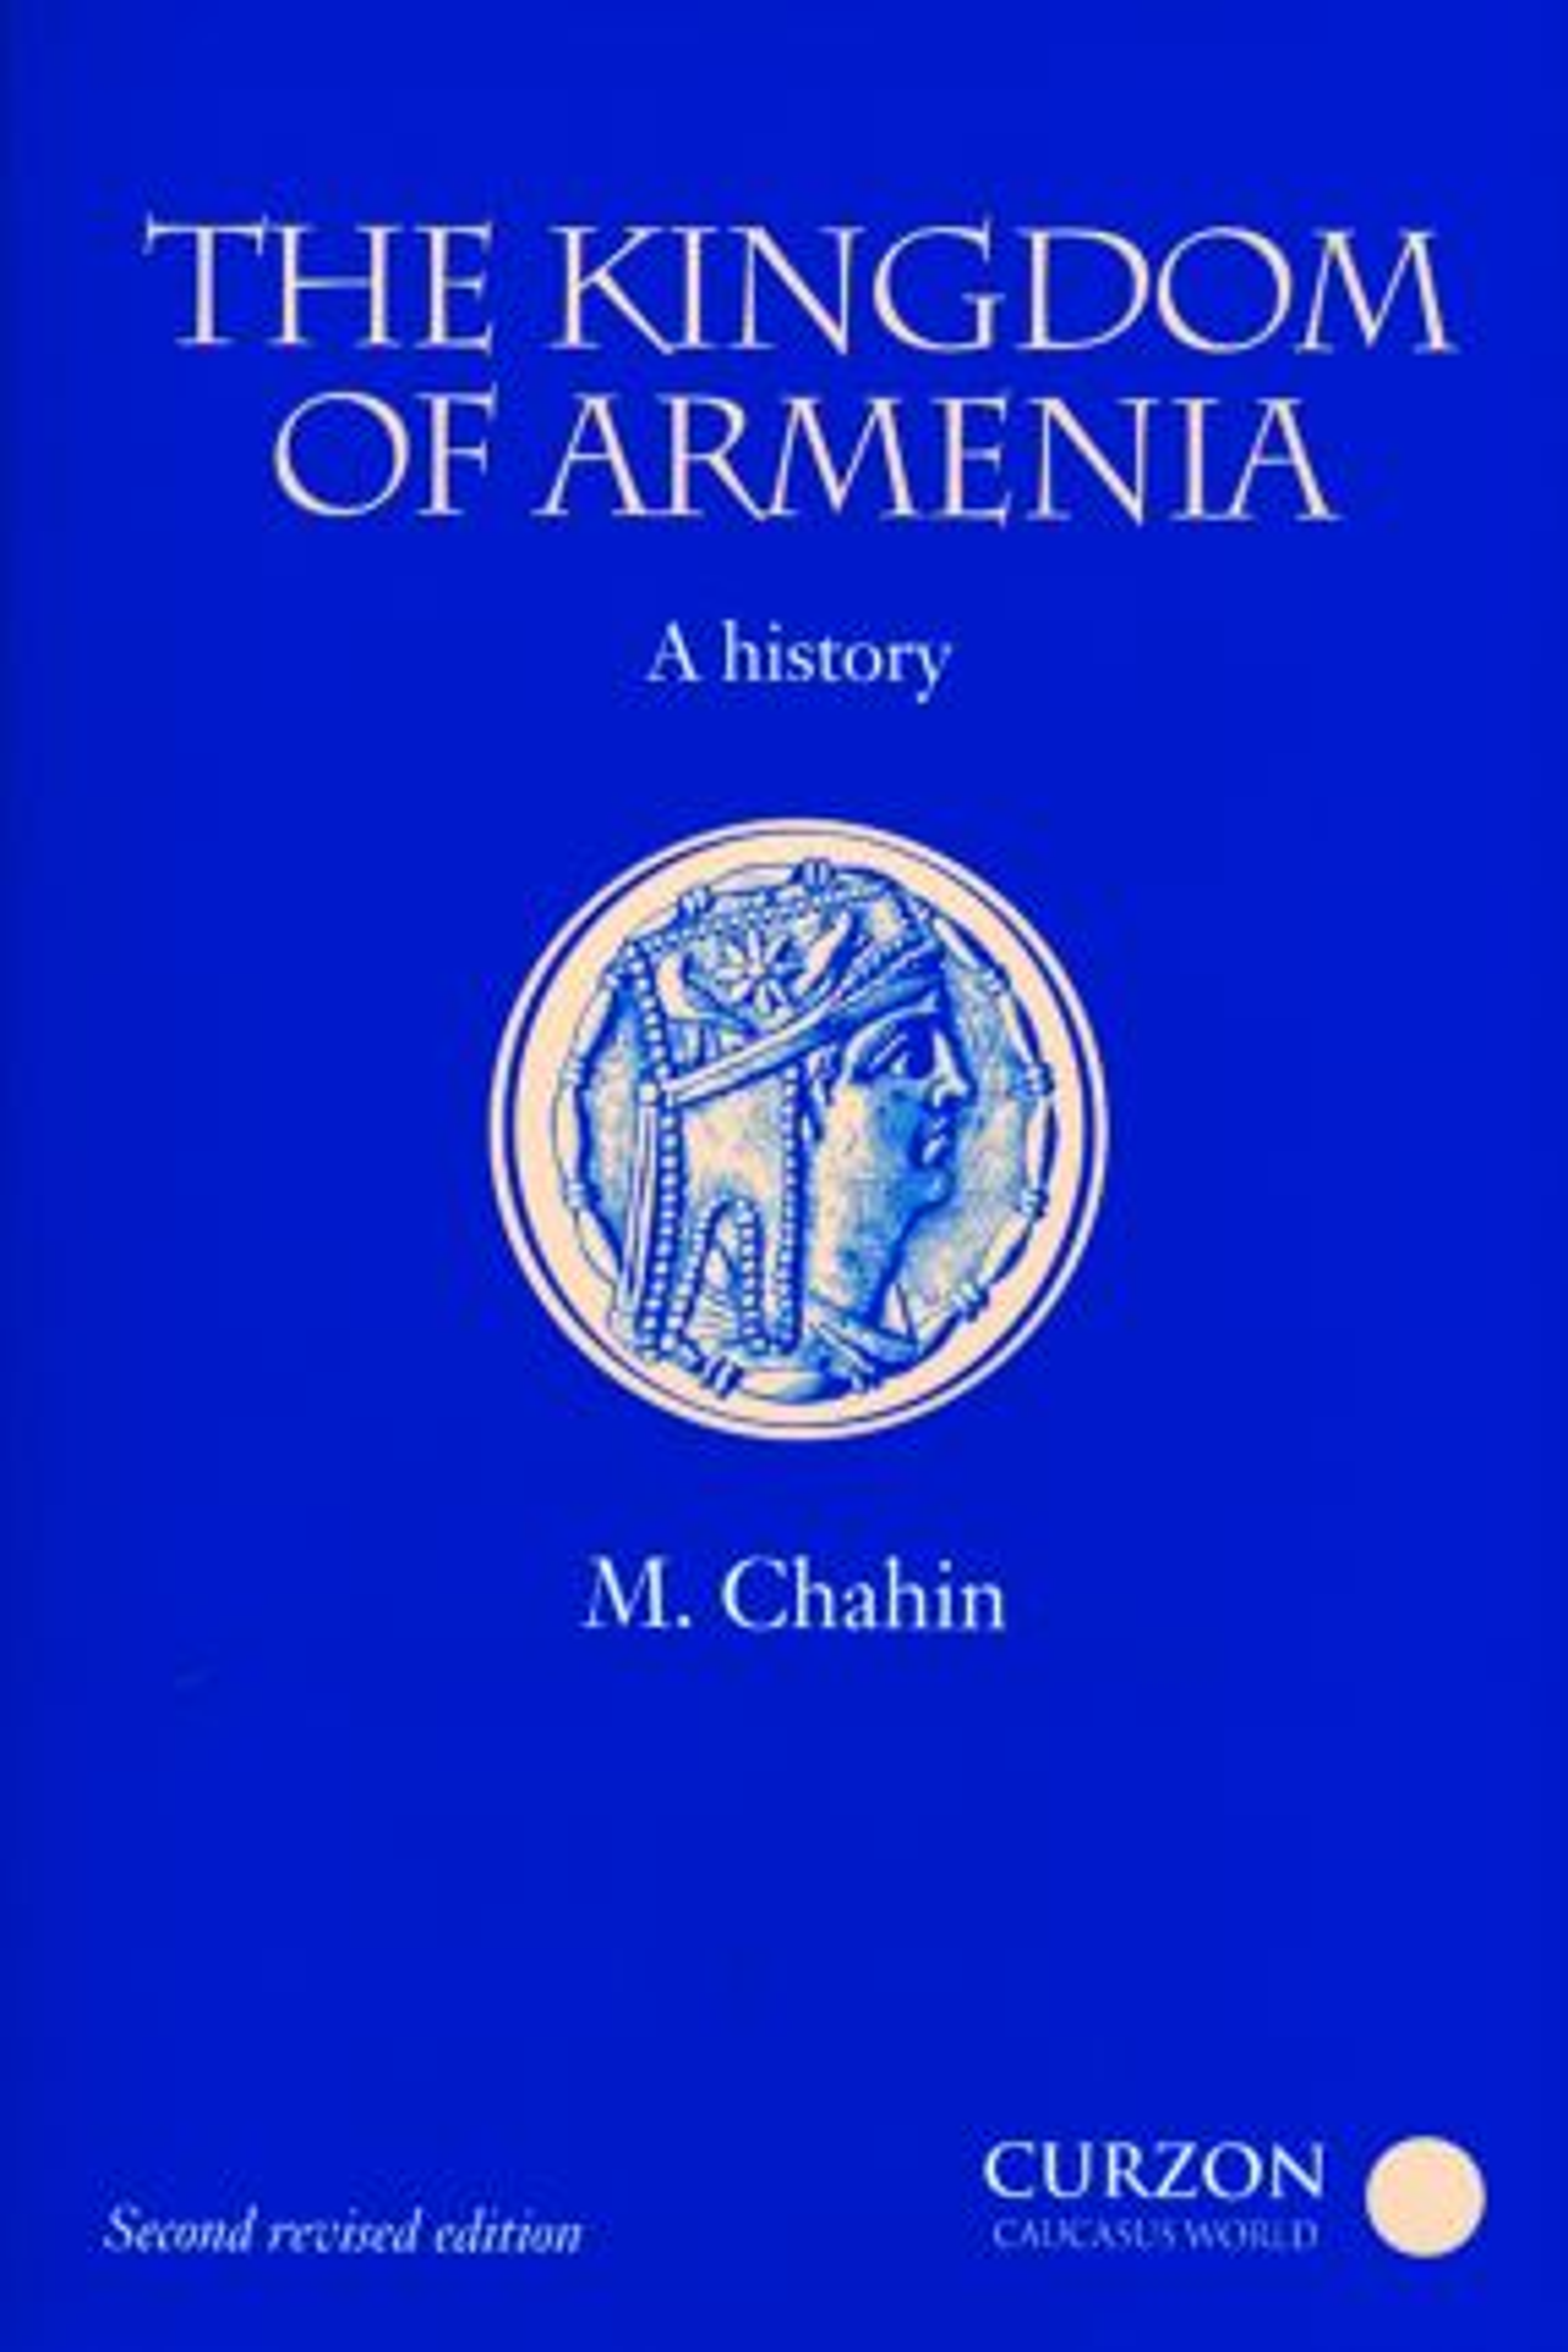 The Kingdom of Armenia: New Edition book cover